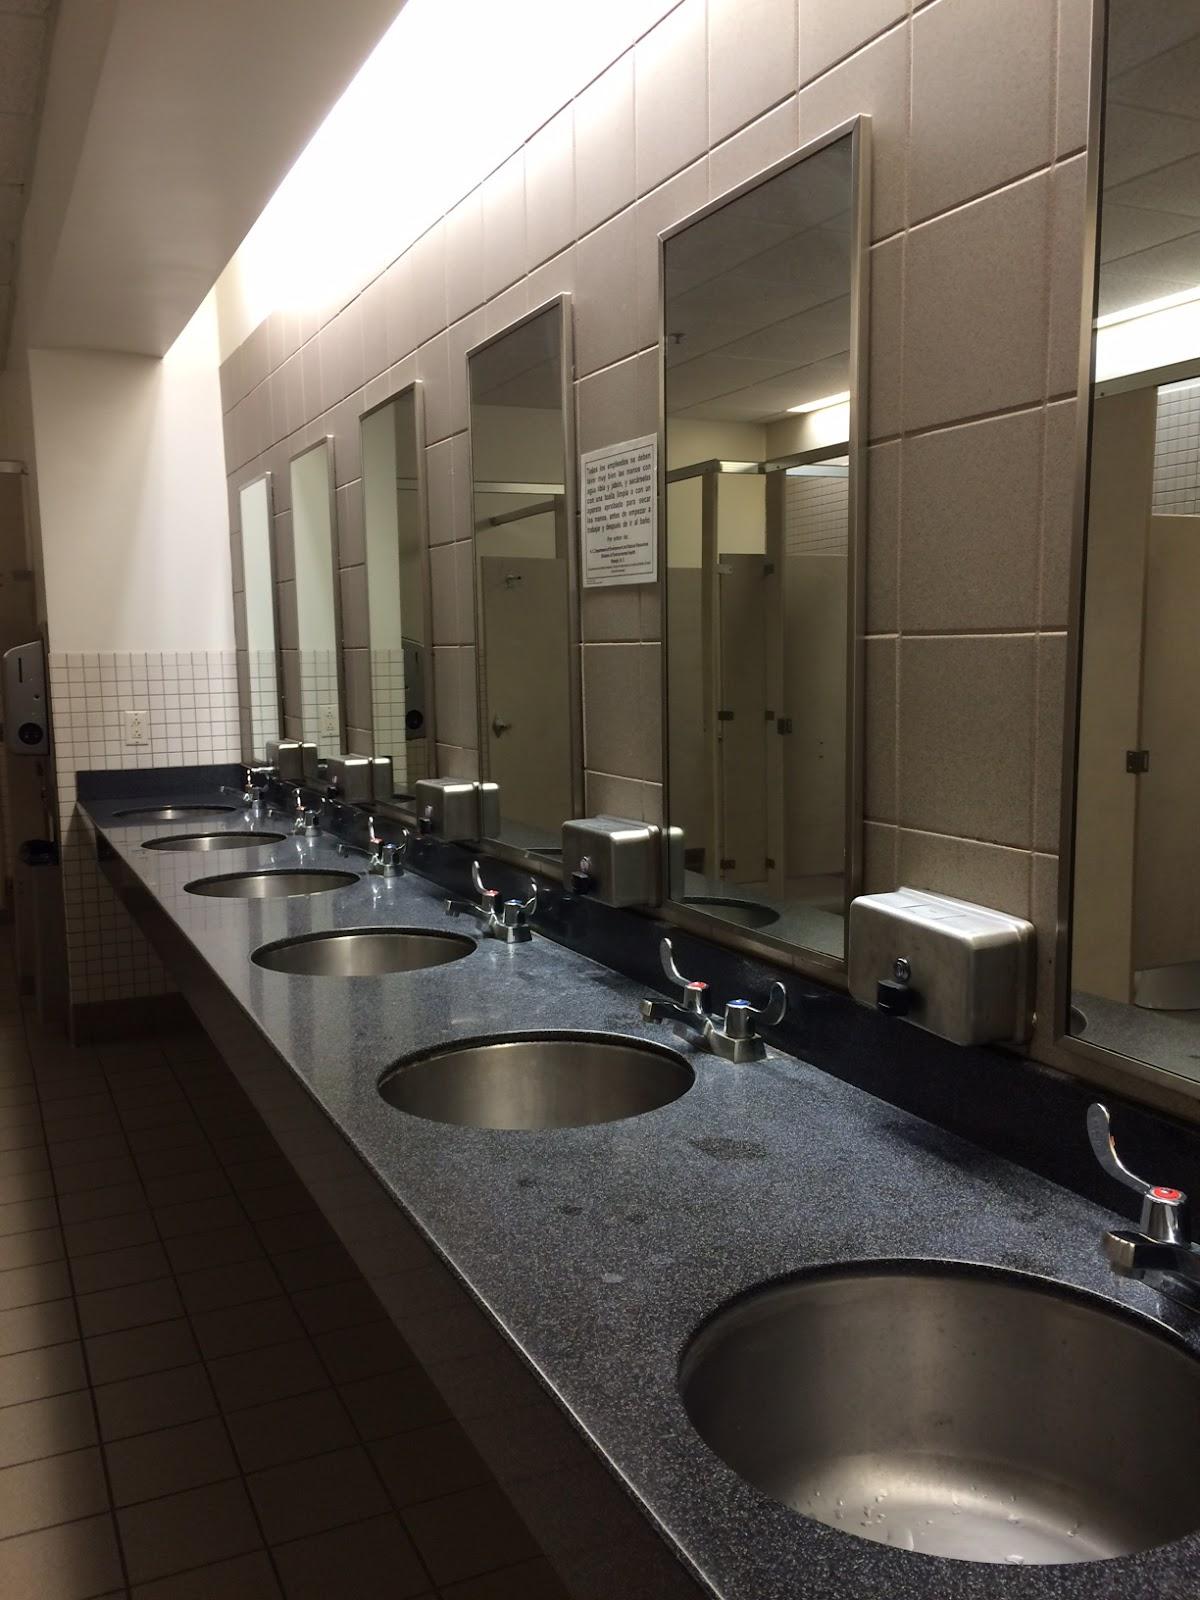 Less Traffic Than The Bathroom On The Union S Main Level Fairly Clean Fairly Good Atmosphere All Around An Ok Bathroom